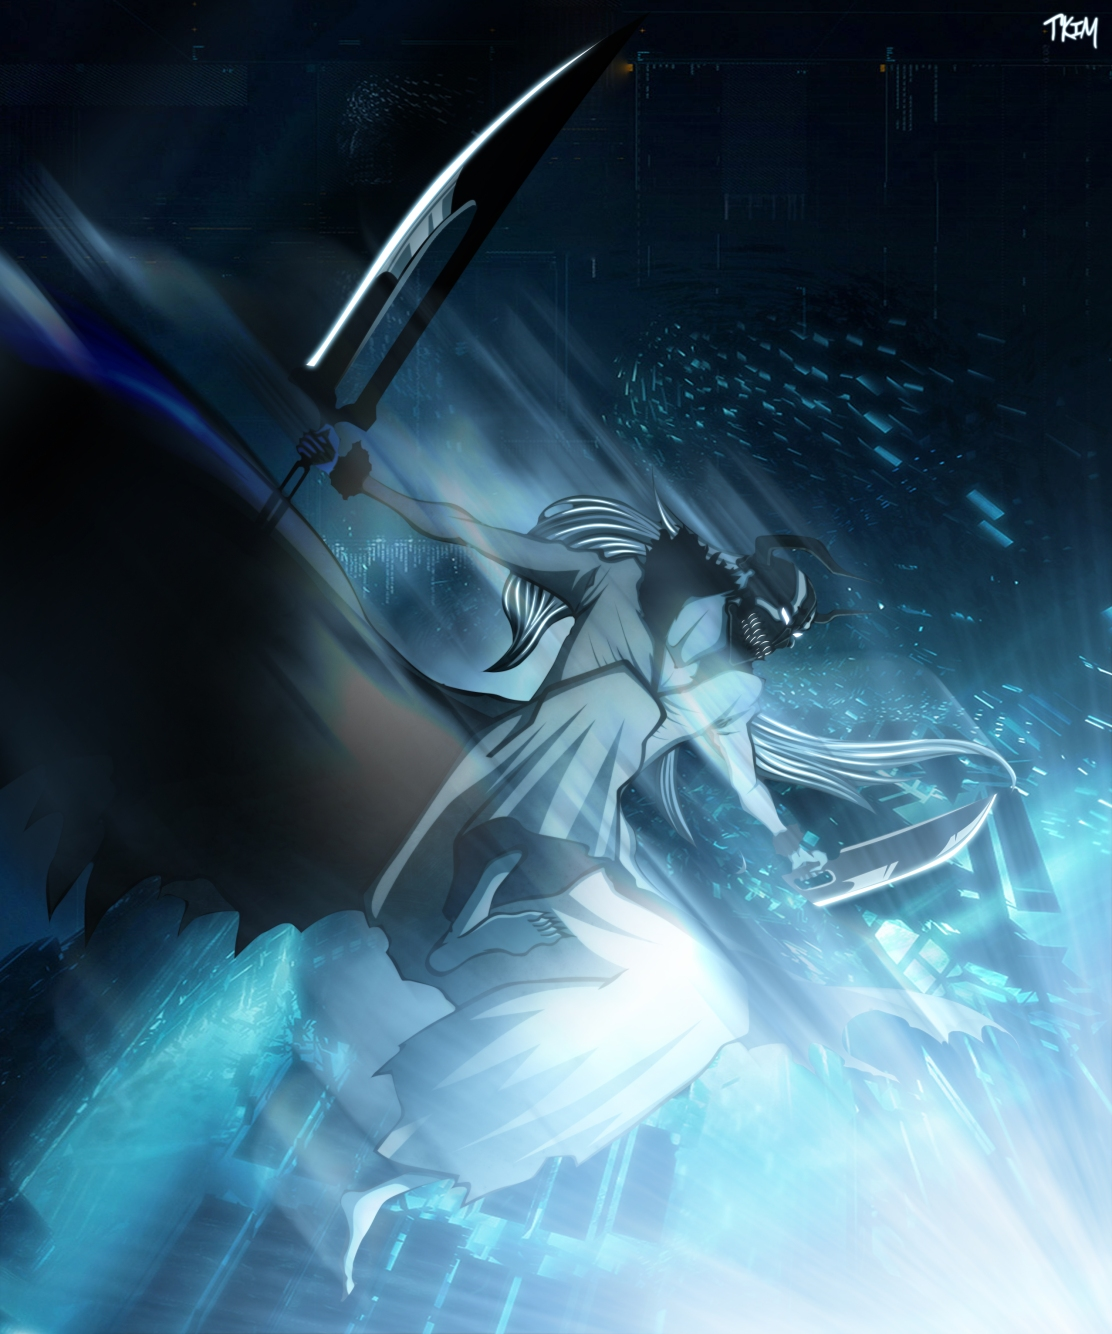 Hollow With A Blade – Hollow Ichigo Kurosaki